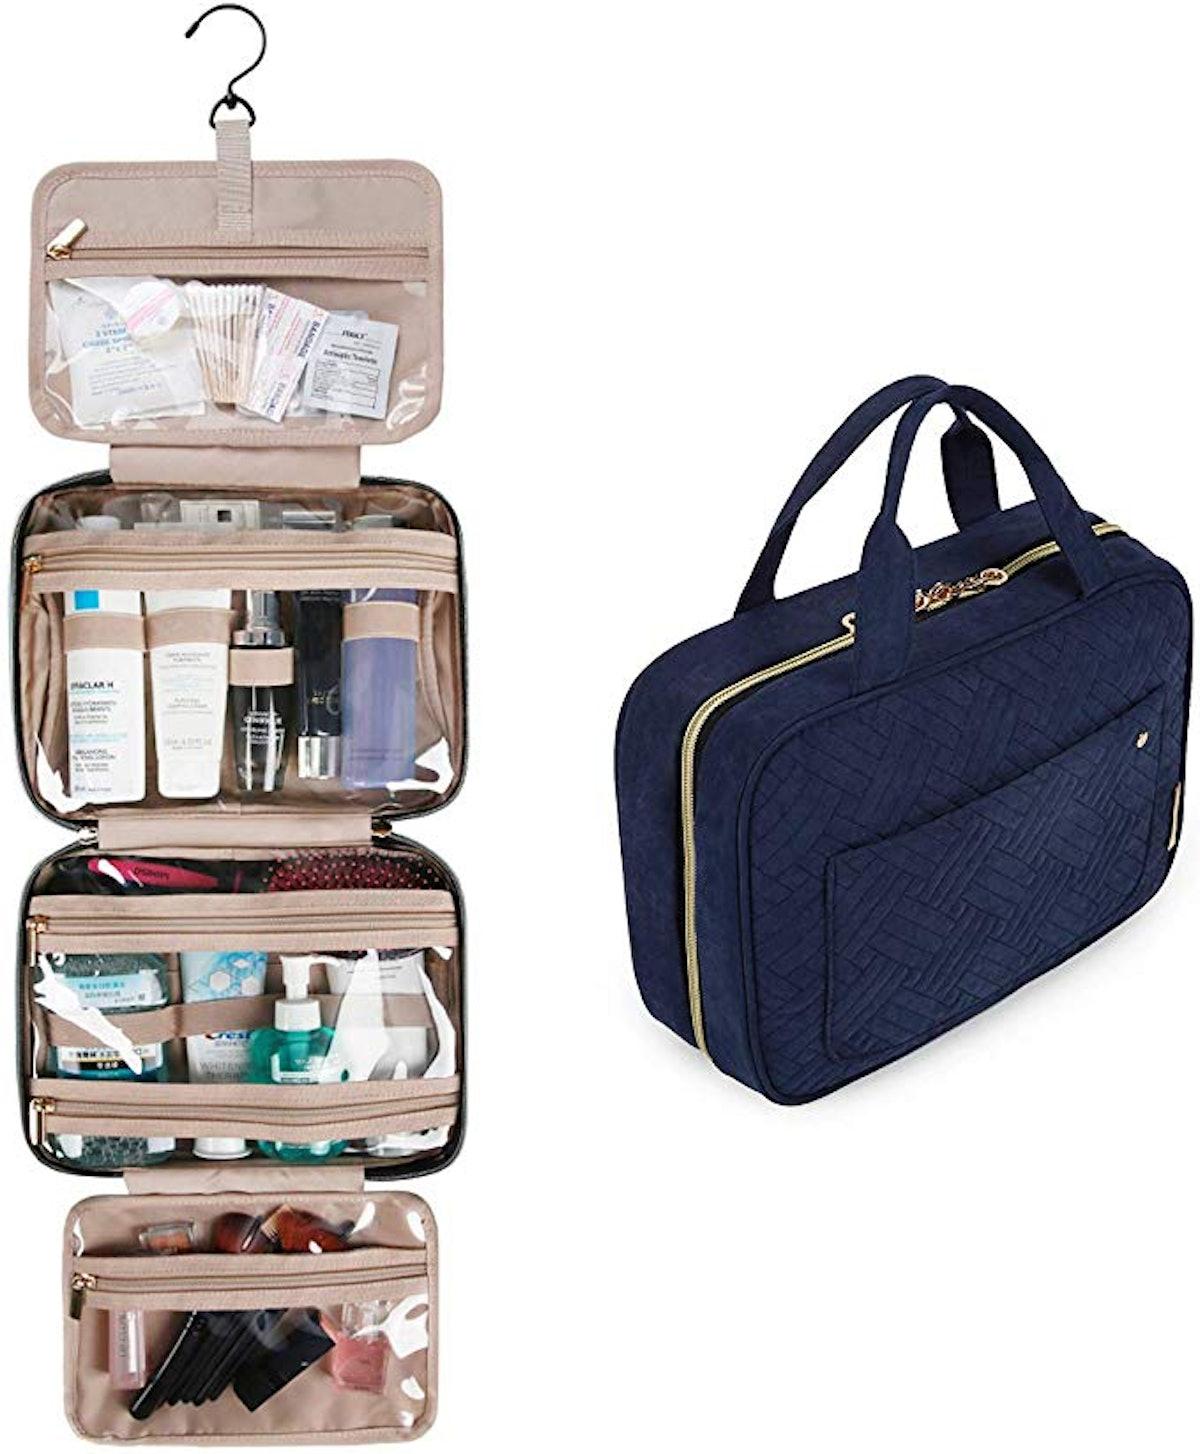 BAGSMART Toiletry Bag Travel Bag